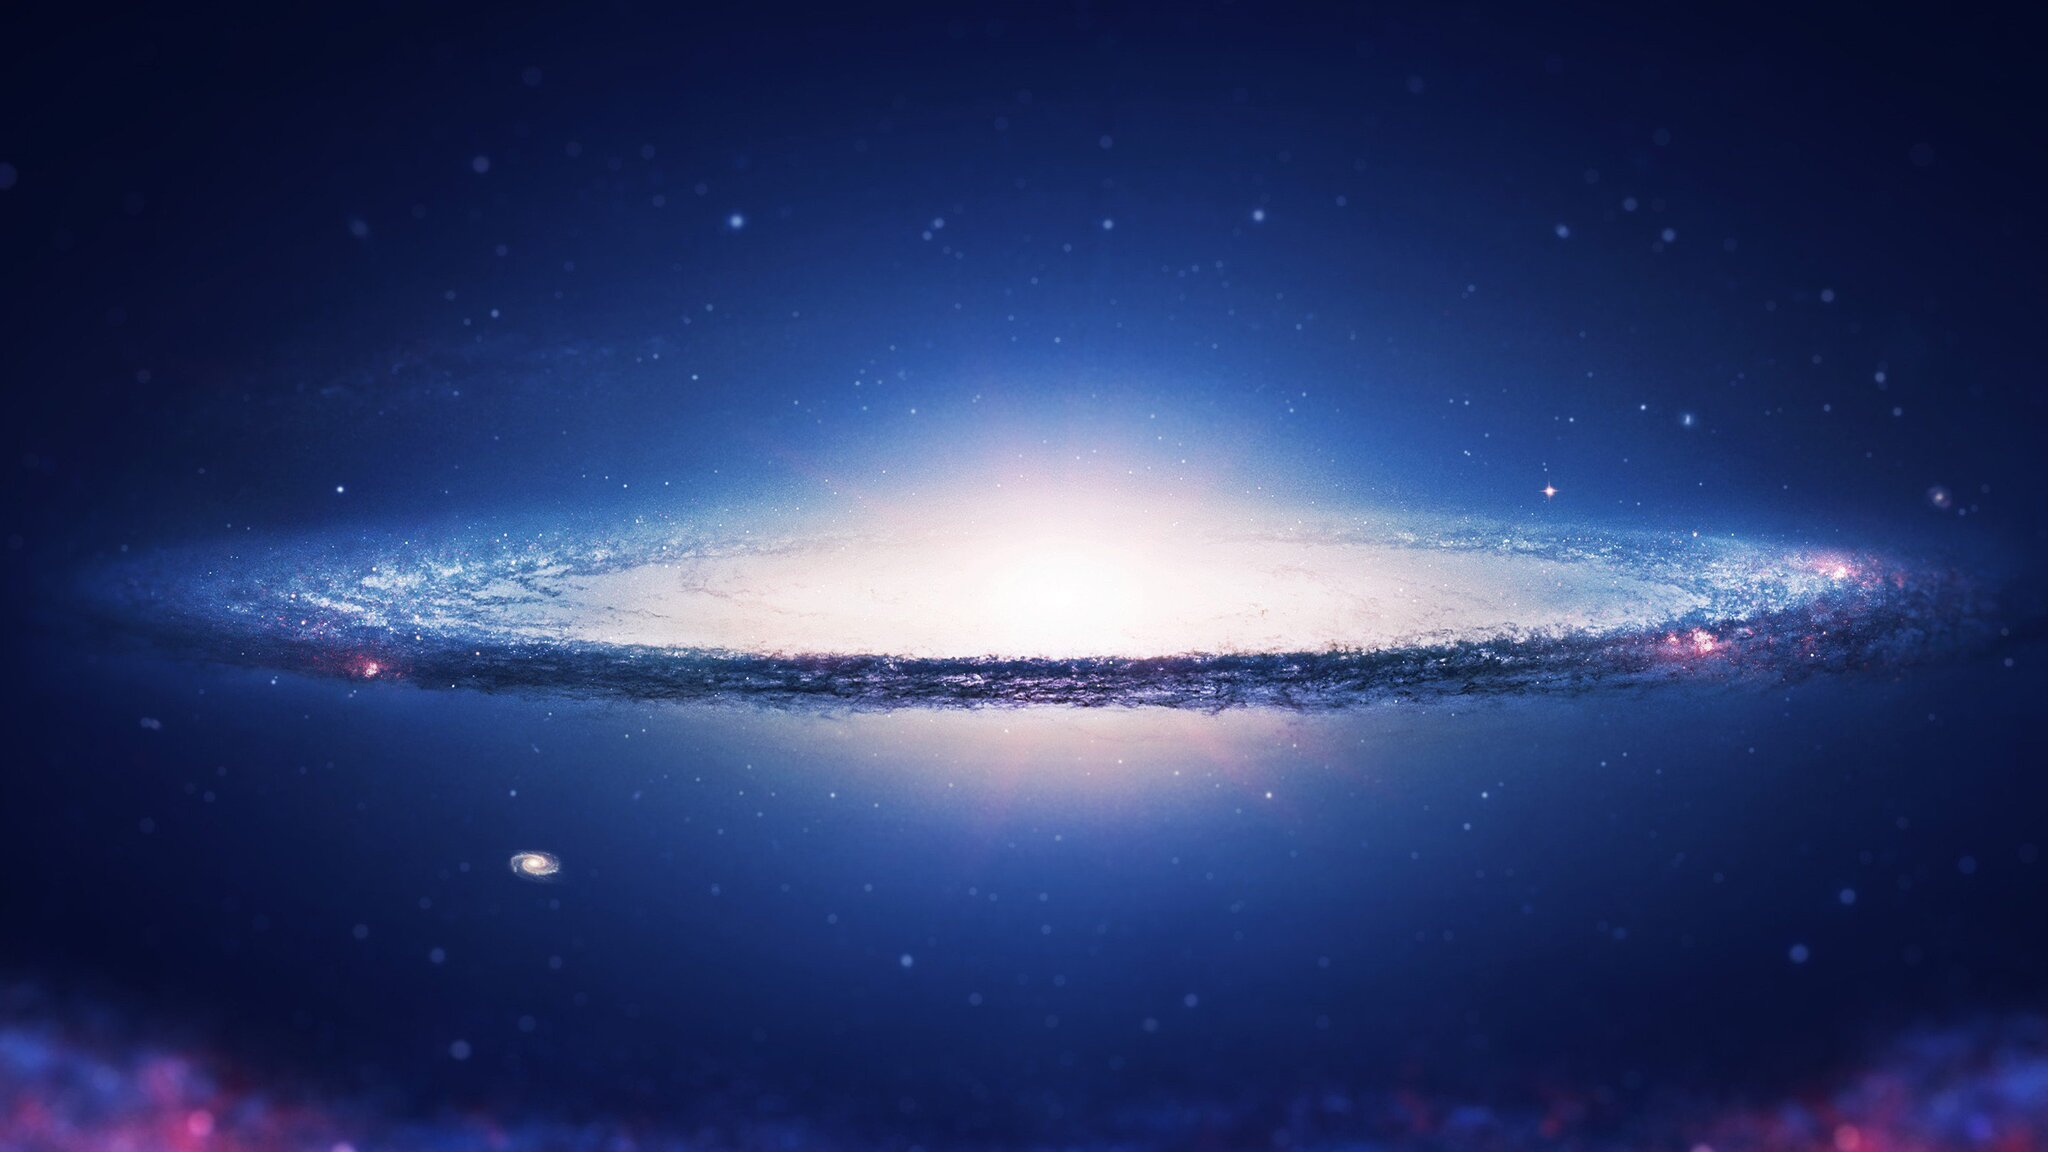 2048x1152 Spiral Galaxy 2048x1152 Resolution HD 4k